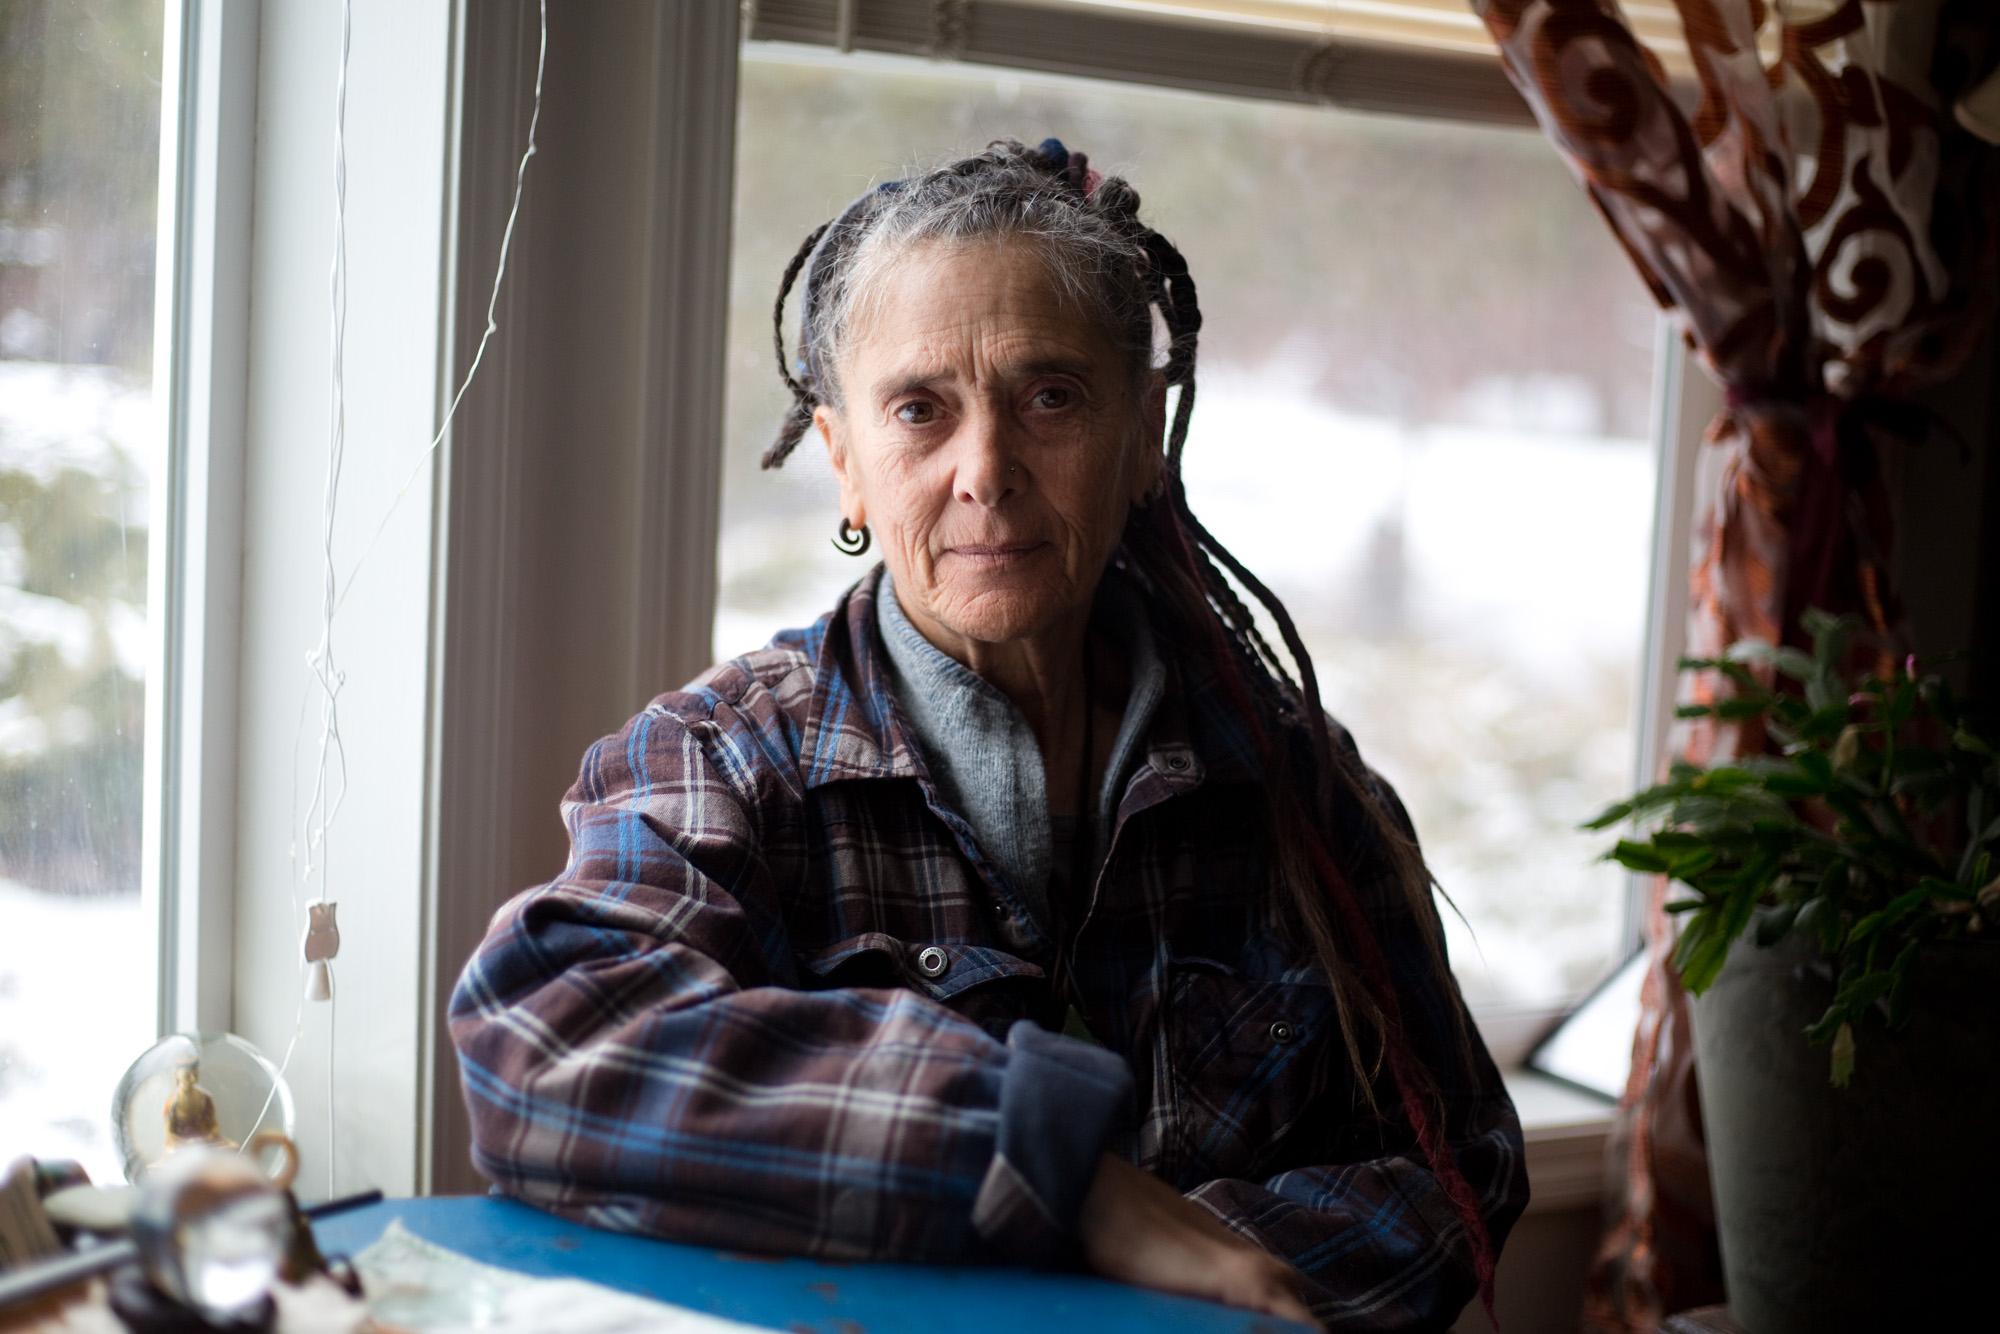 Hillary Hurst, 64, at her home